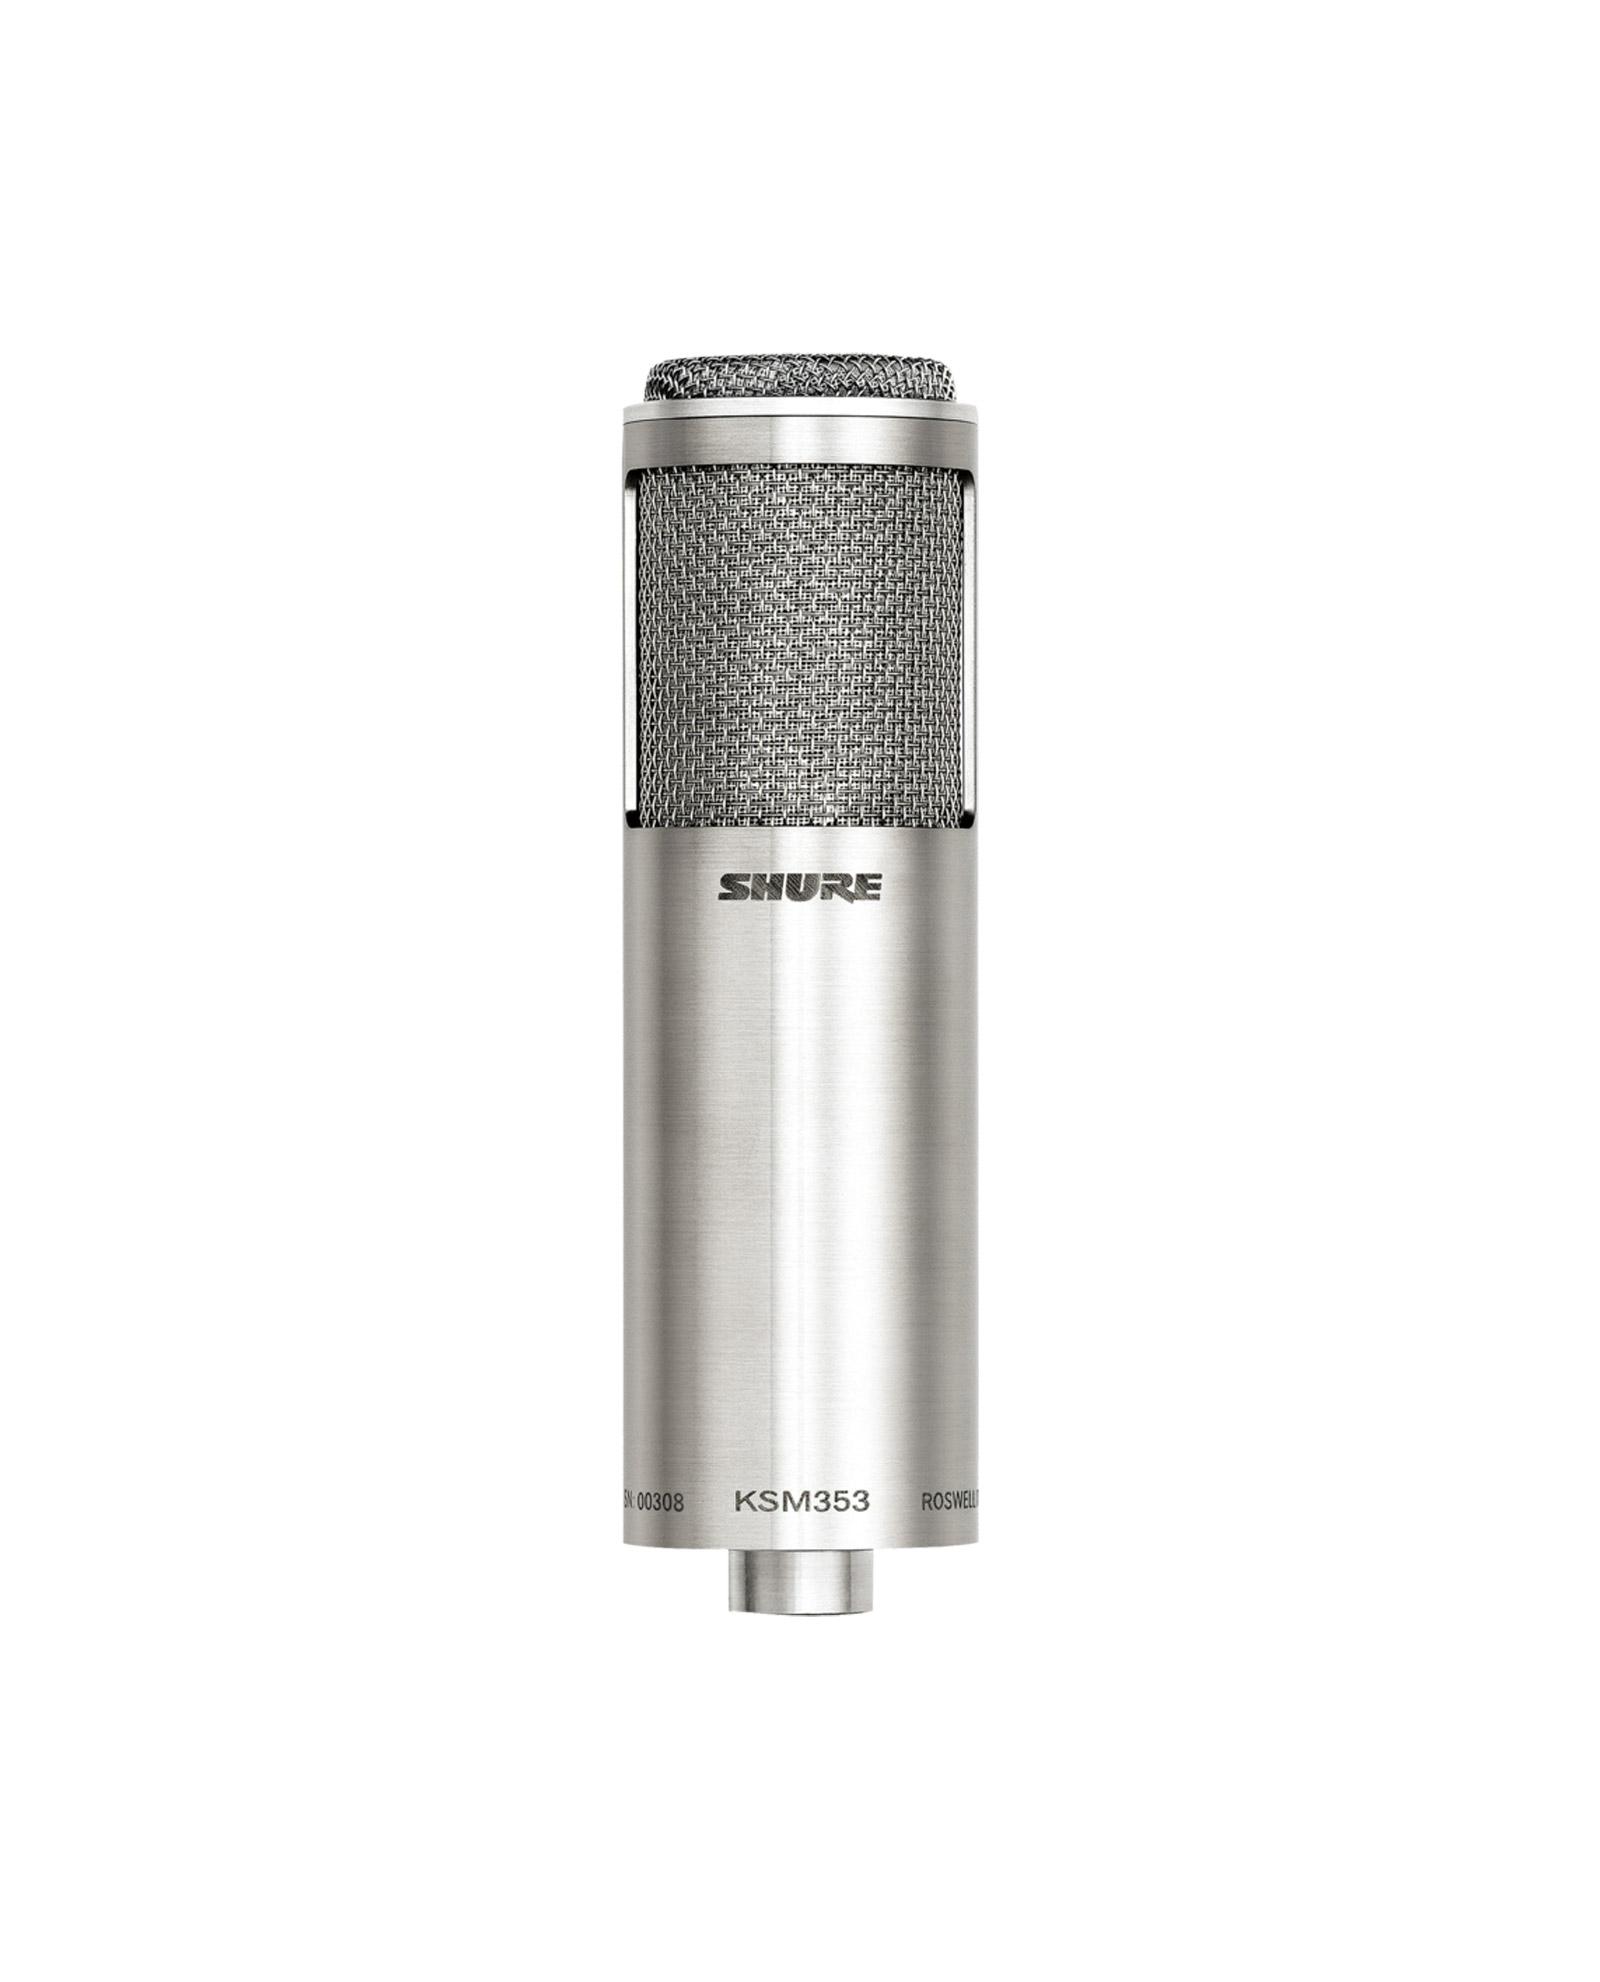 Shure Ksm353 Ed Ribbon Microphone 1